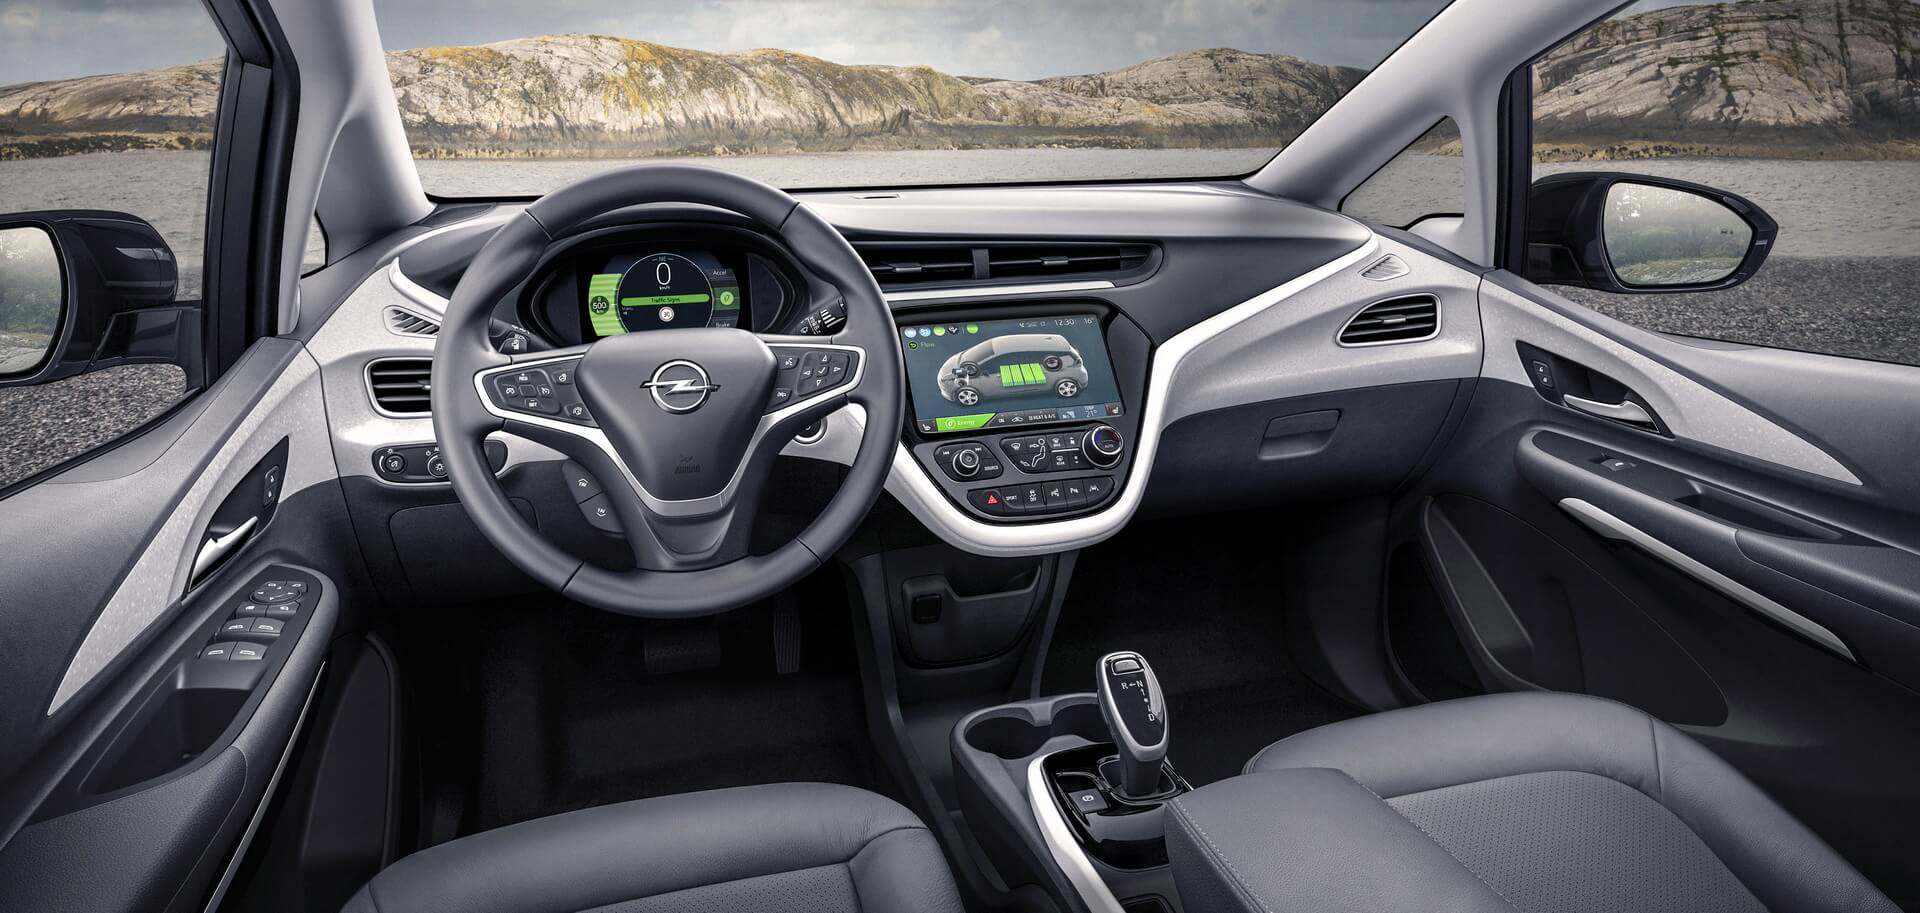 Фотография экоавто Opel Ampera-e - фото 71